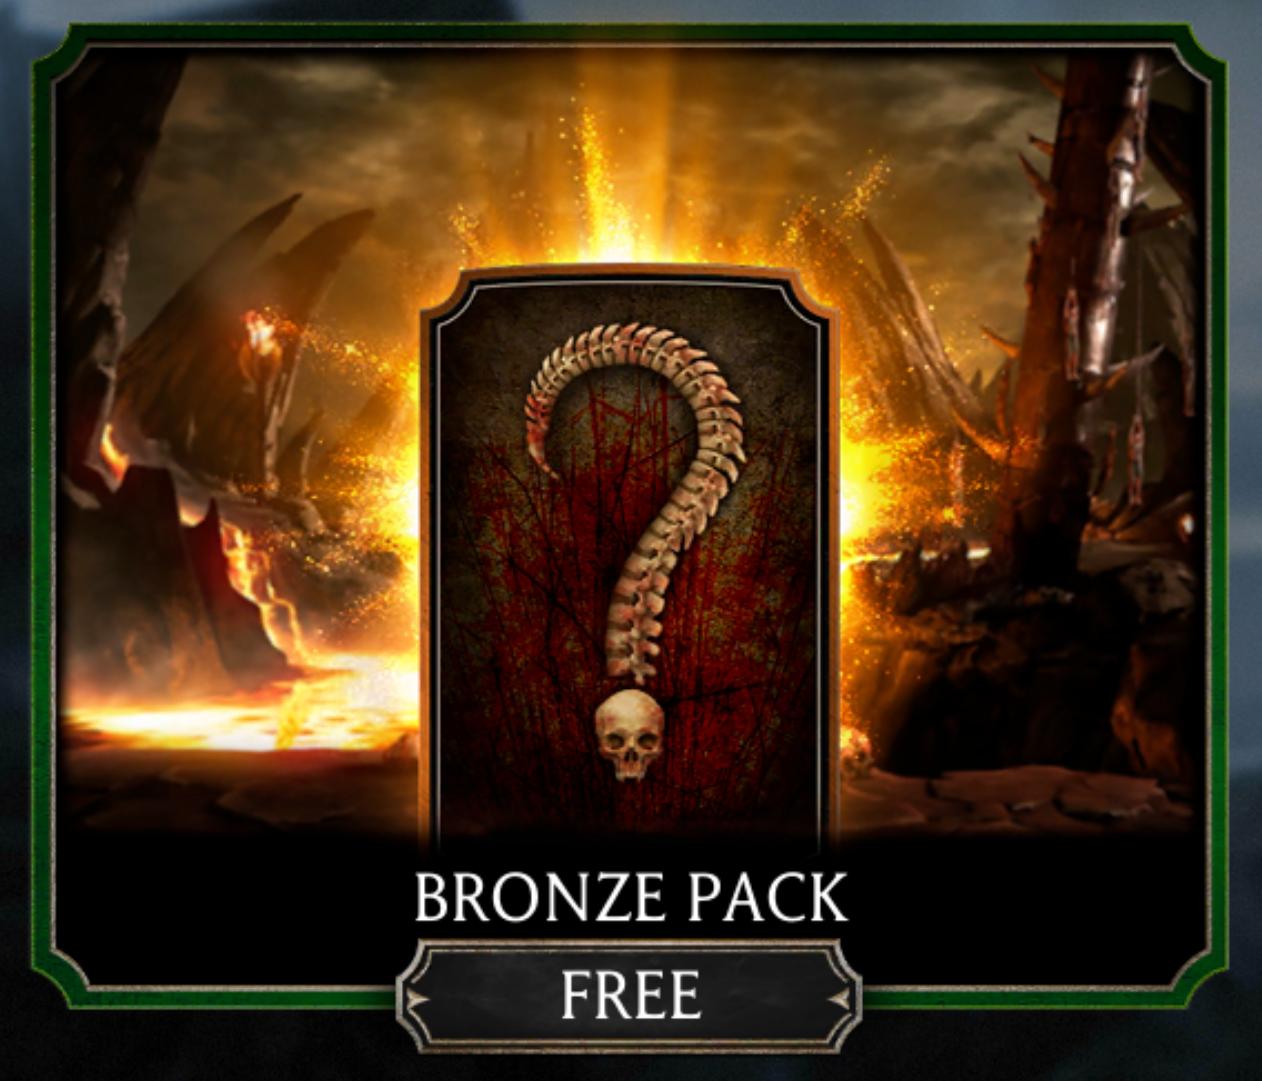 Bronze Pack | Mortal Kombat Mobile Wikia | FANDOM powered by Wikia